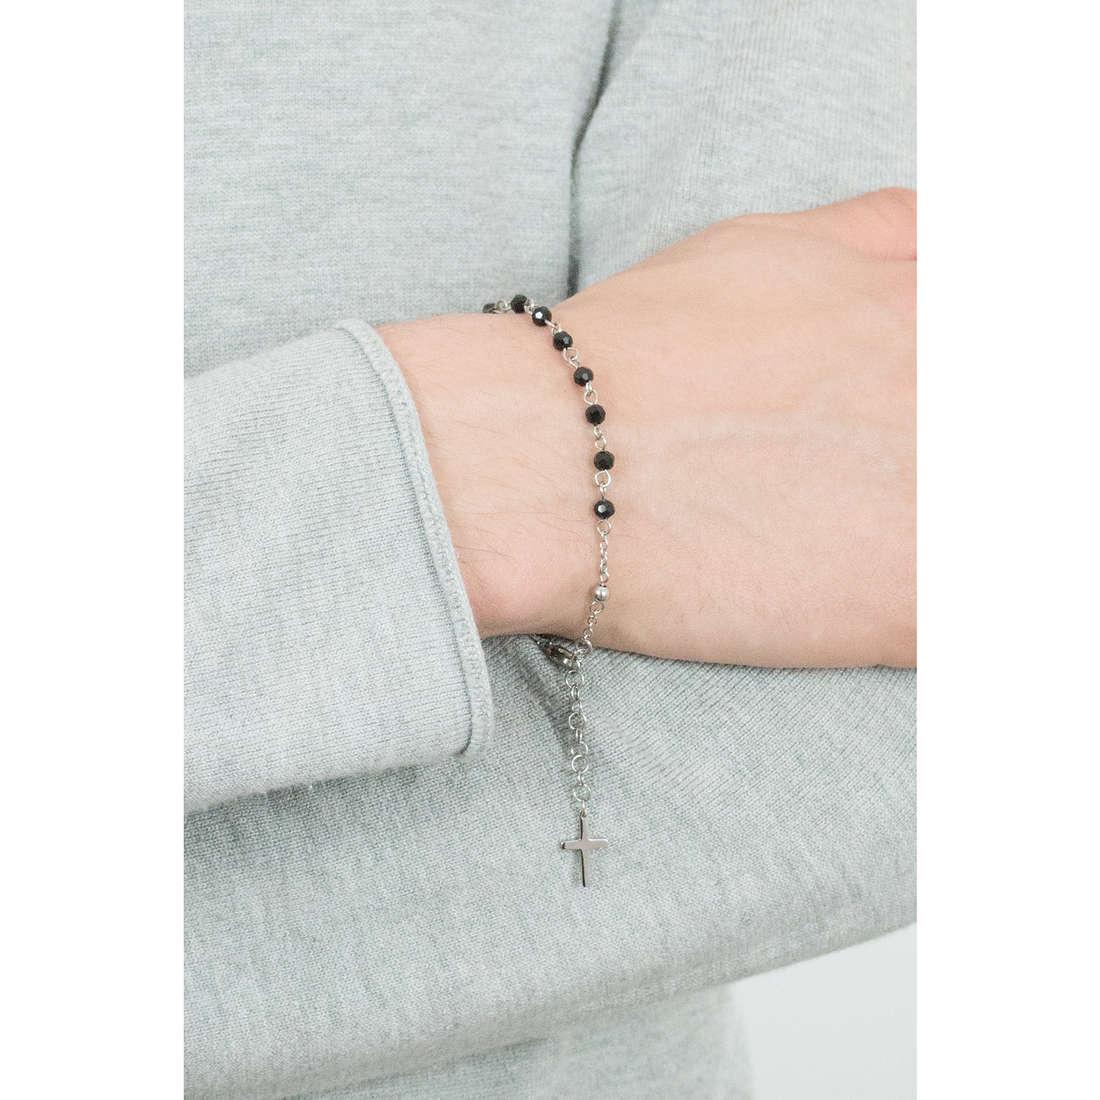 Luca Barra bracciali Religion Soul uomo LBBA797 indosso